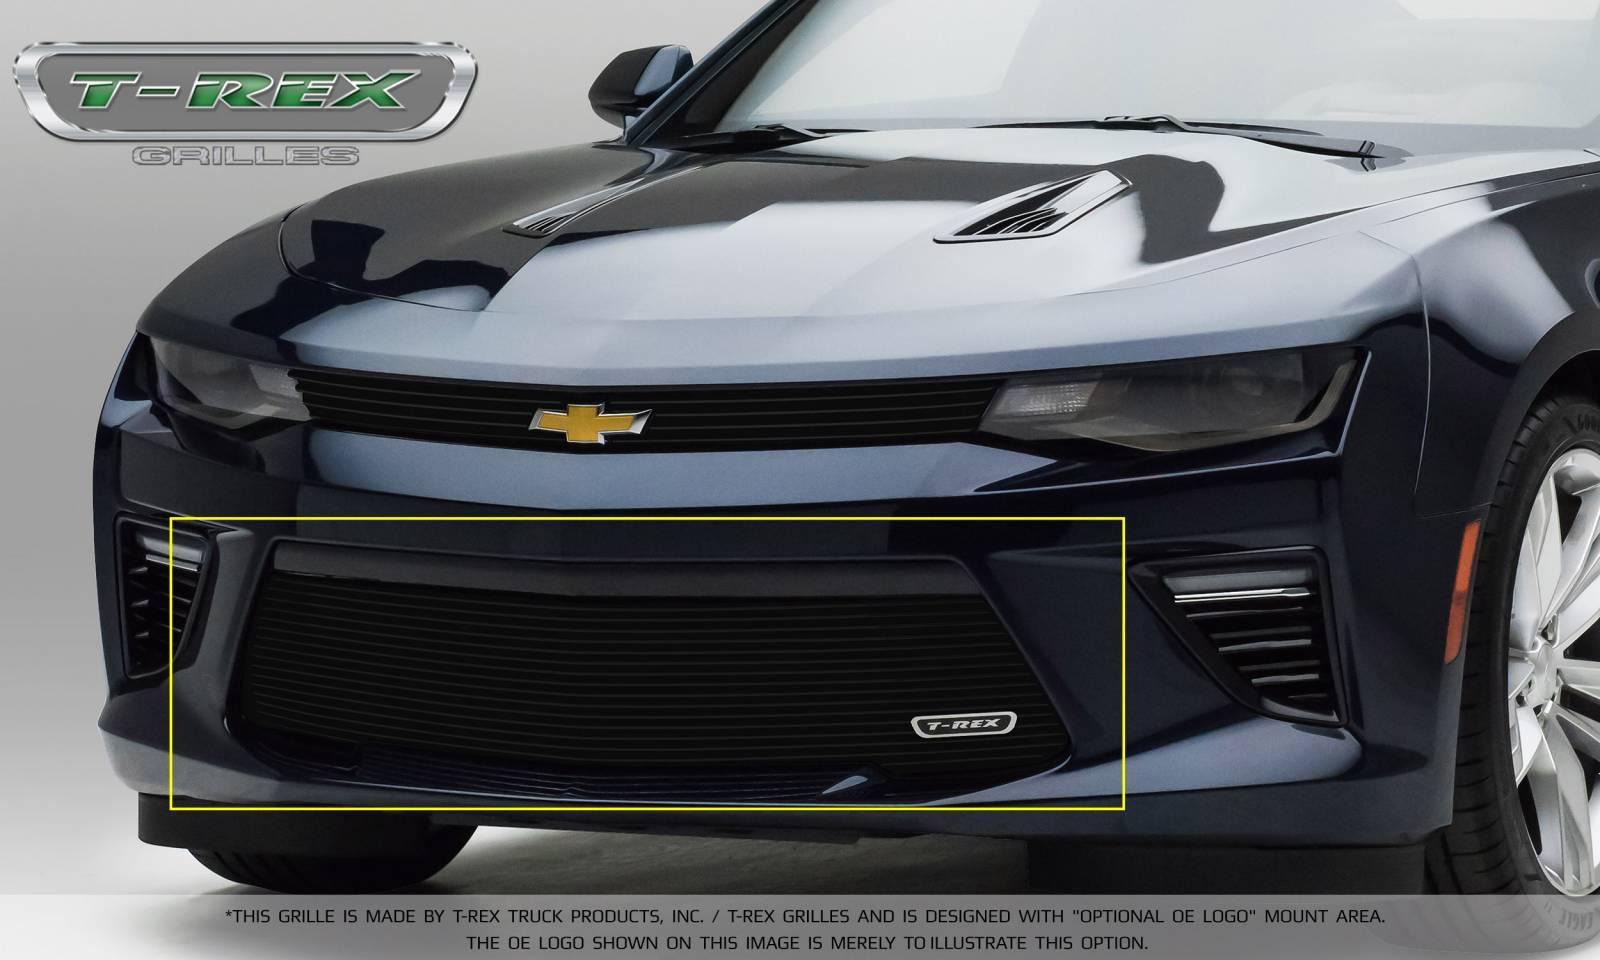 T-REX Grilles - T-REX Chevrolet Camaro V6 Model - Billet Series - Bumper Grille Overlay with Black Powder Coated Finish - Pt # 25033B